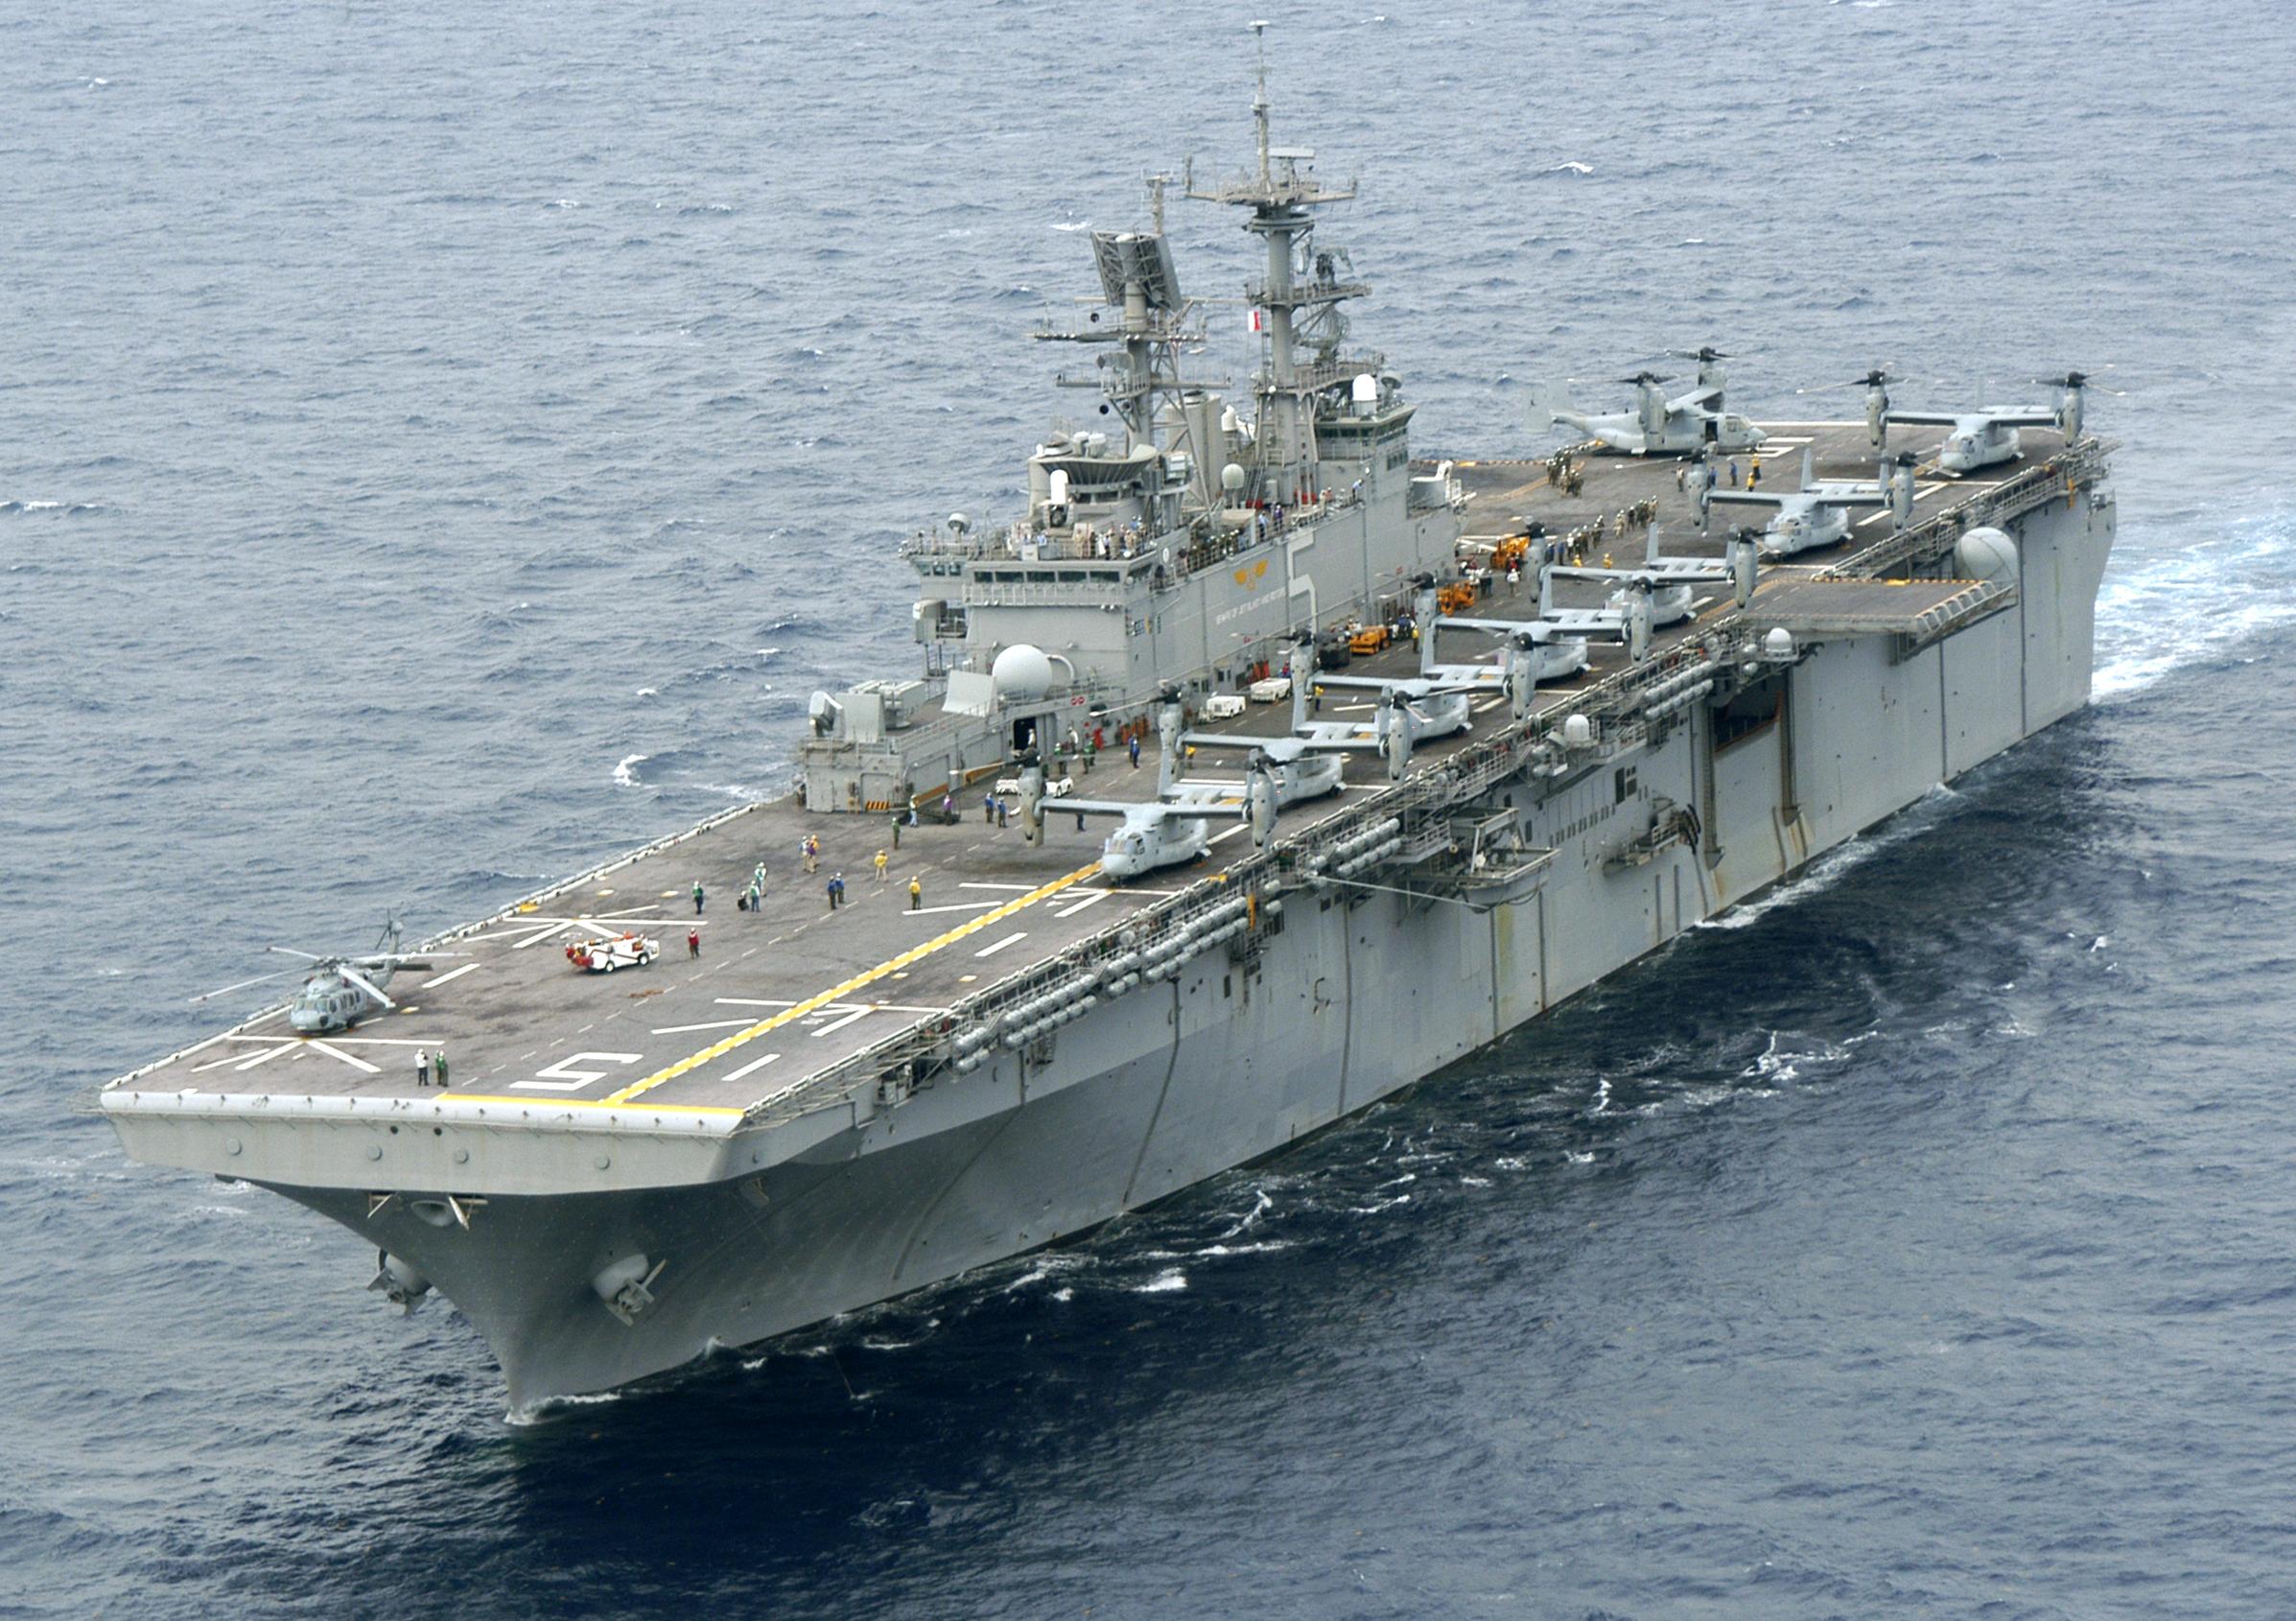 USS BATAAN LHD-5Bild: U.S. Navy